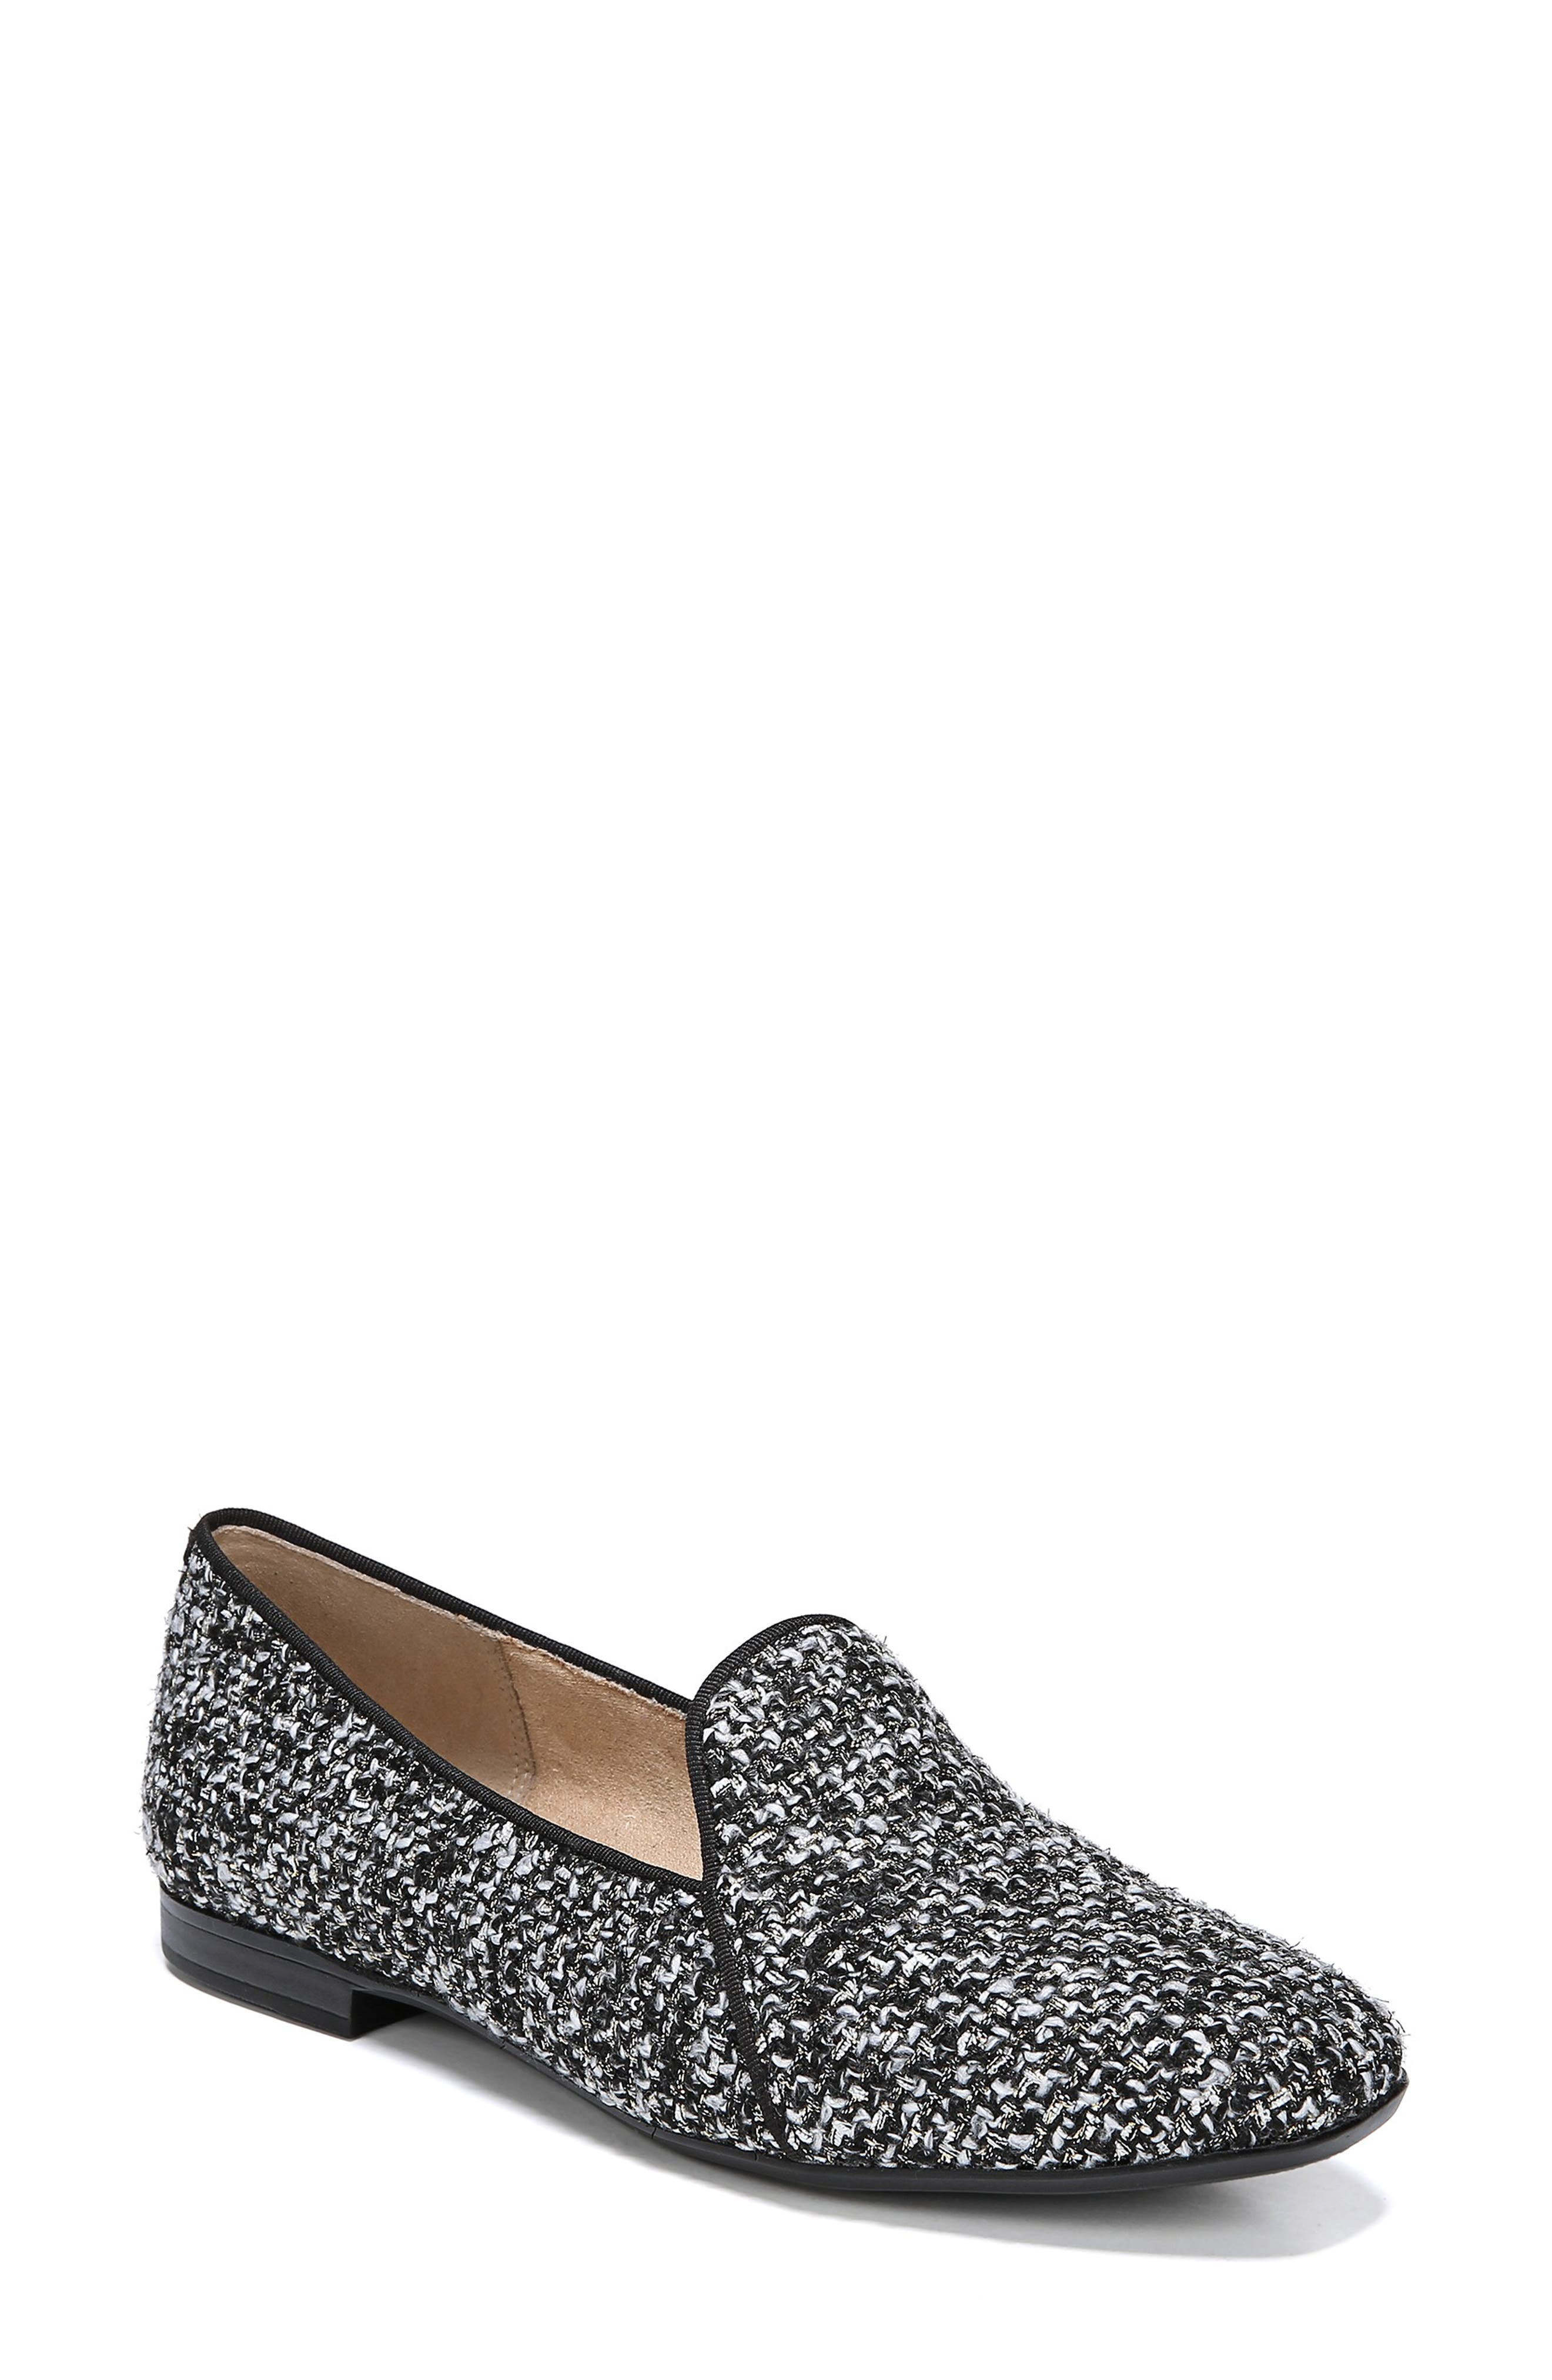 Emiline 2 Loafer,                         Main,                         color, BLACK/ WHITE TWEED FABRIC